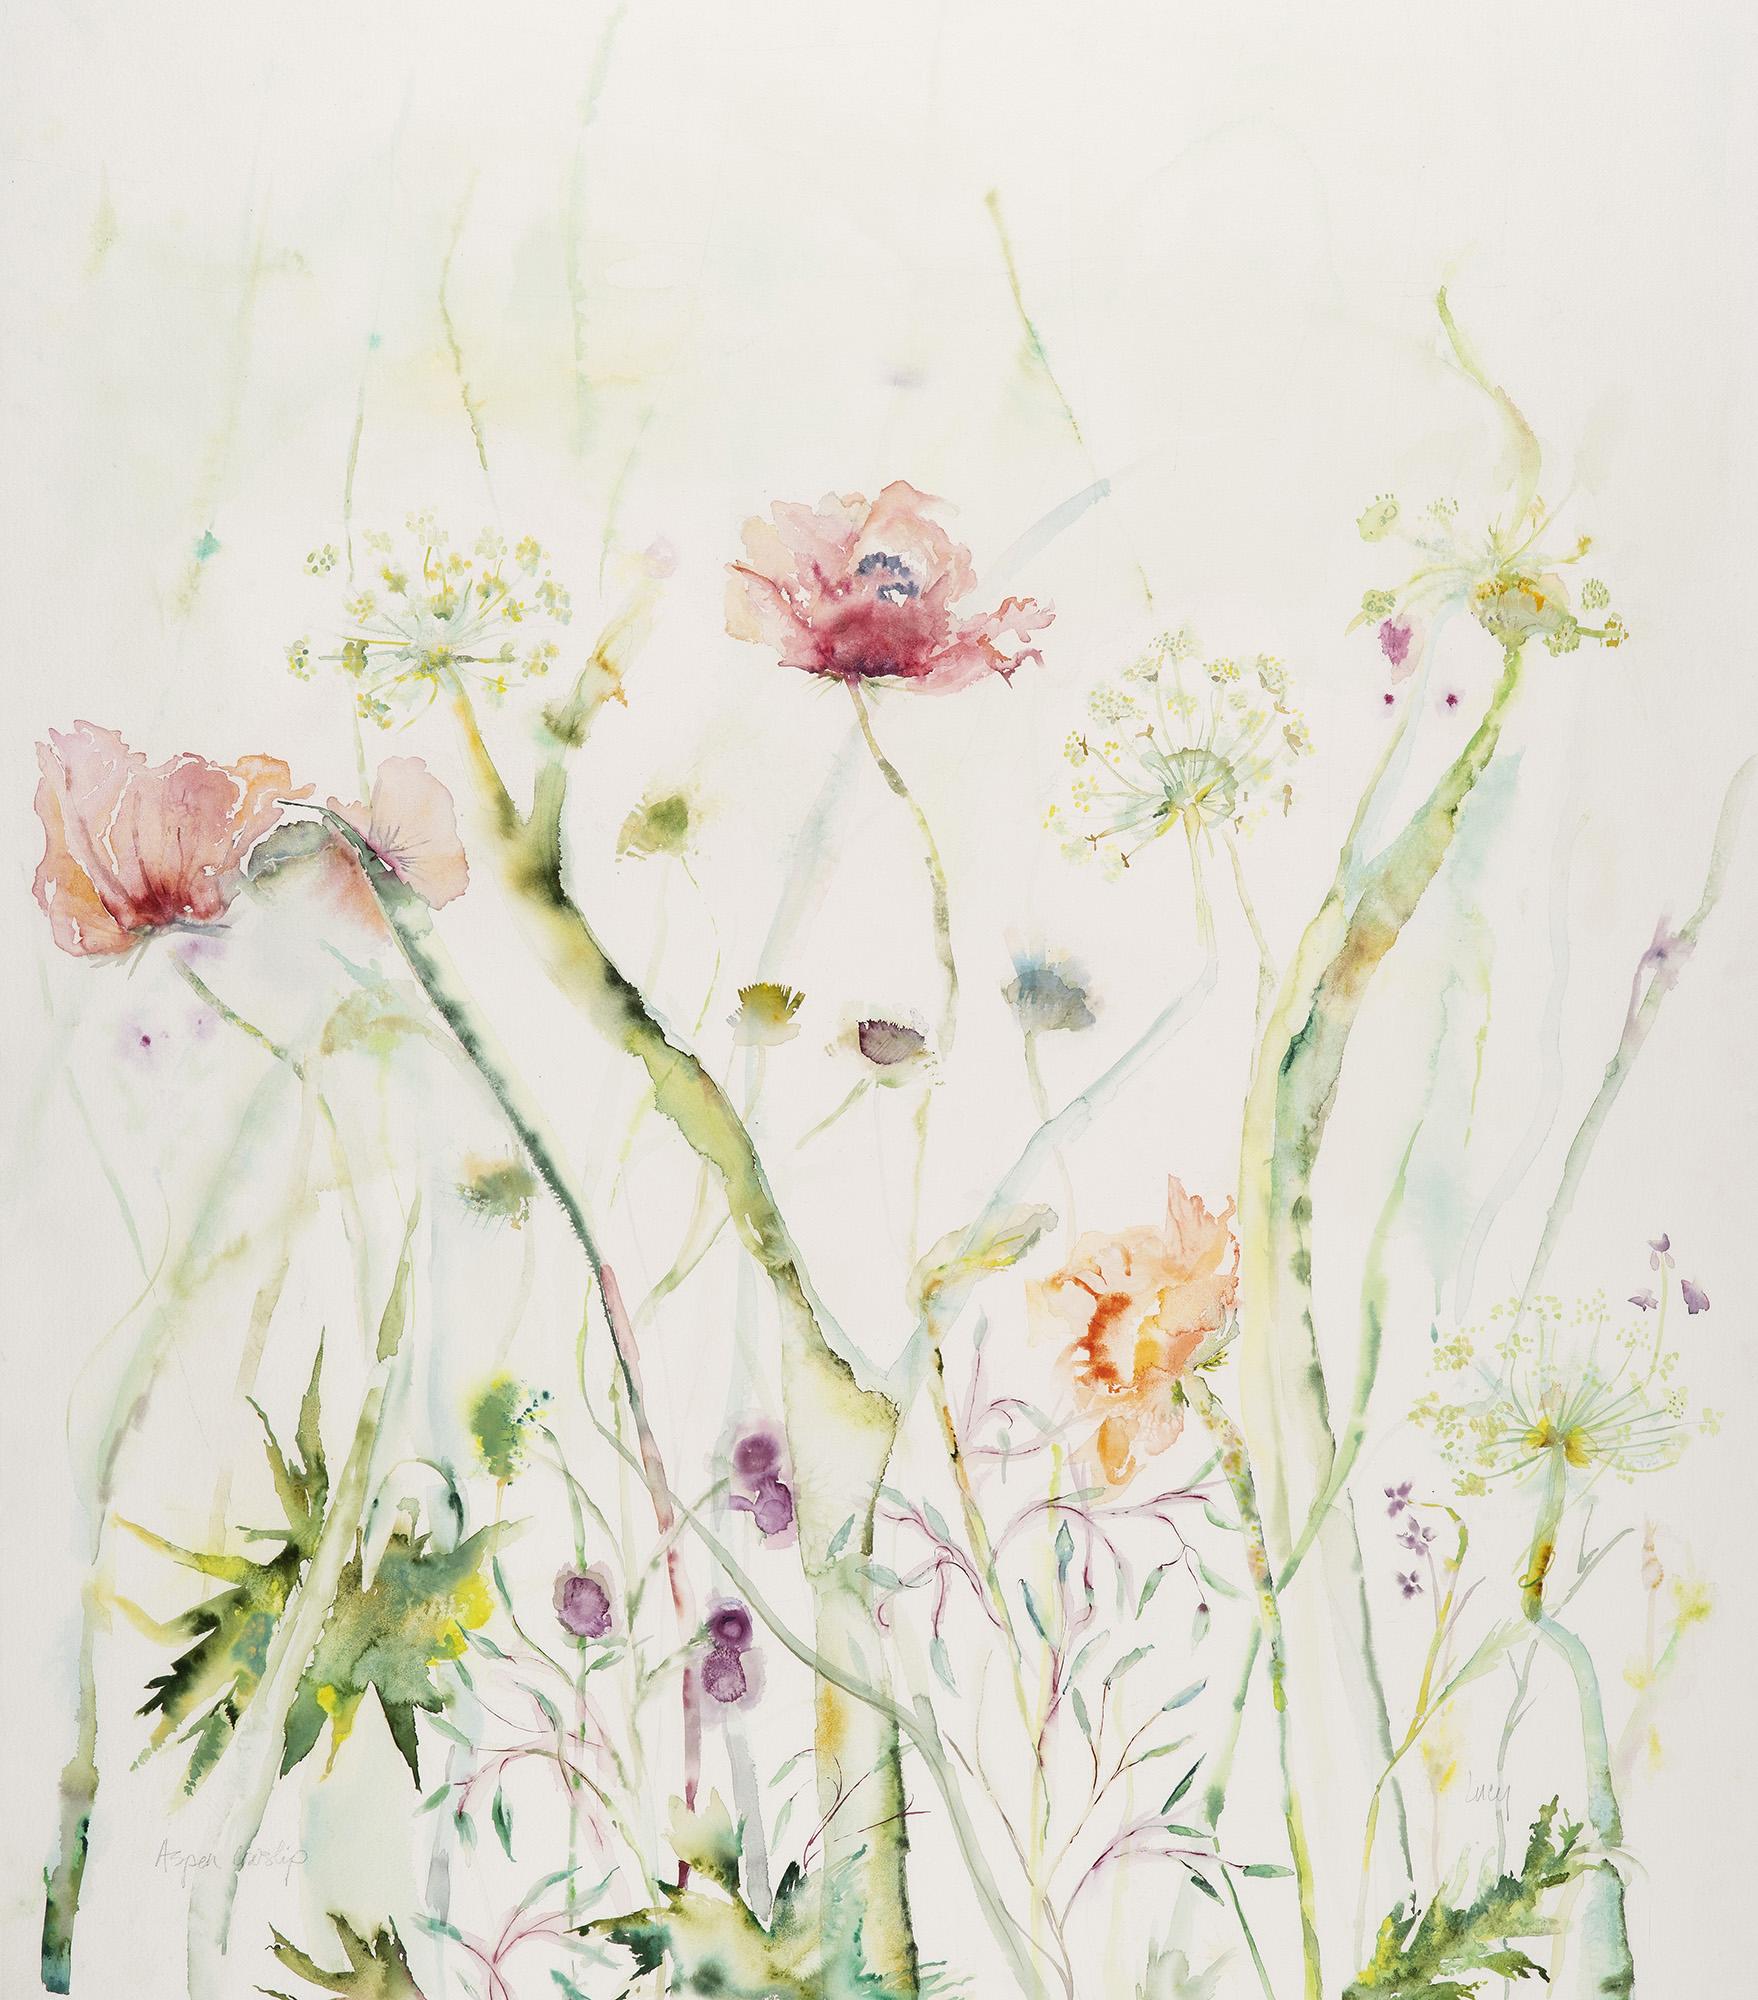 Aspen Cowslips, 2012, Watercolor on paper, 45 x 40 in.